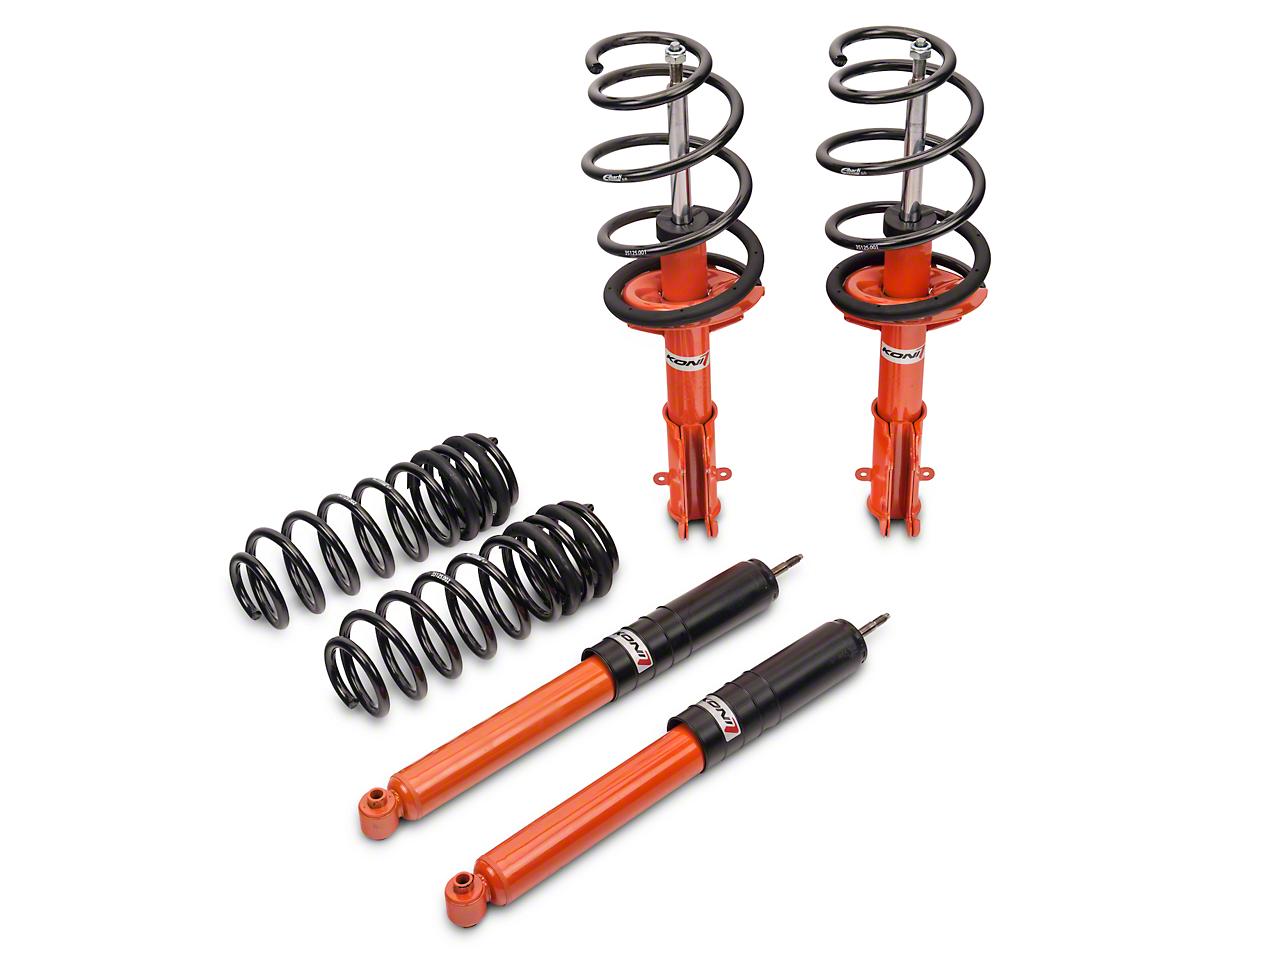 KONI STR.T Shock, Strut & Eibach Pro-Kit Lowering Spring Kit (11-14 GT, V6, BOSS)